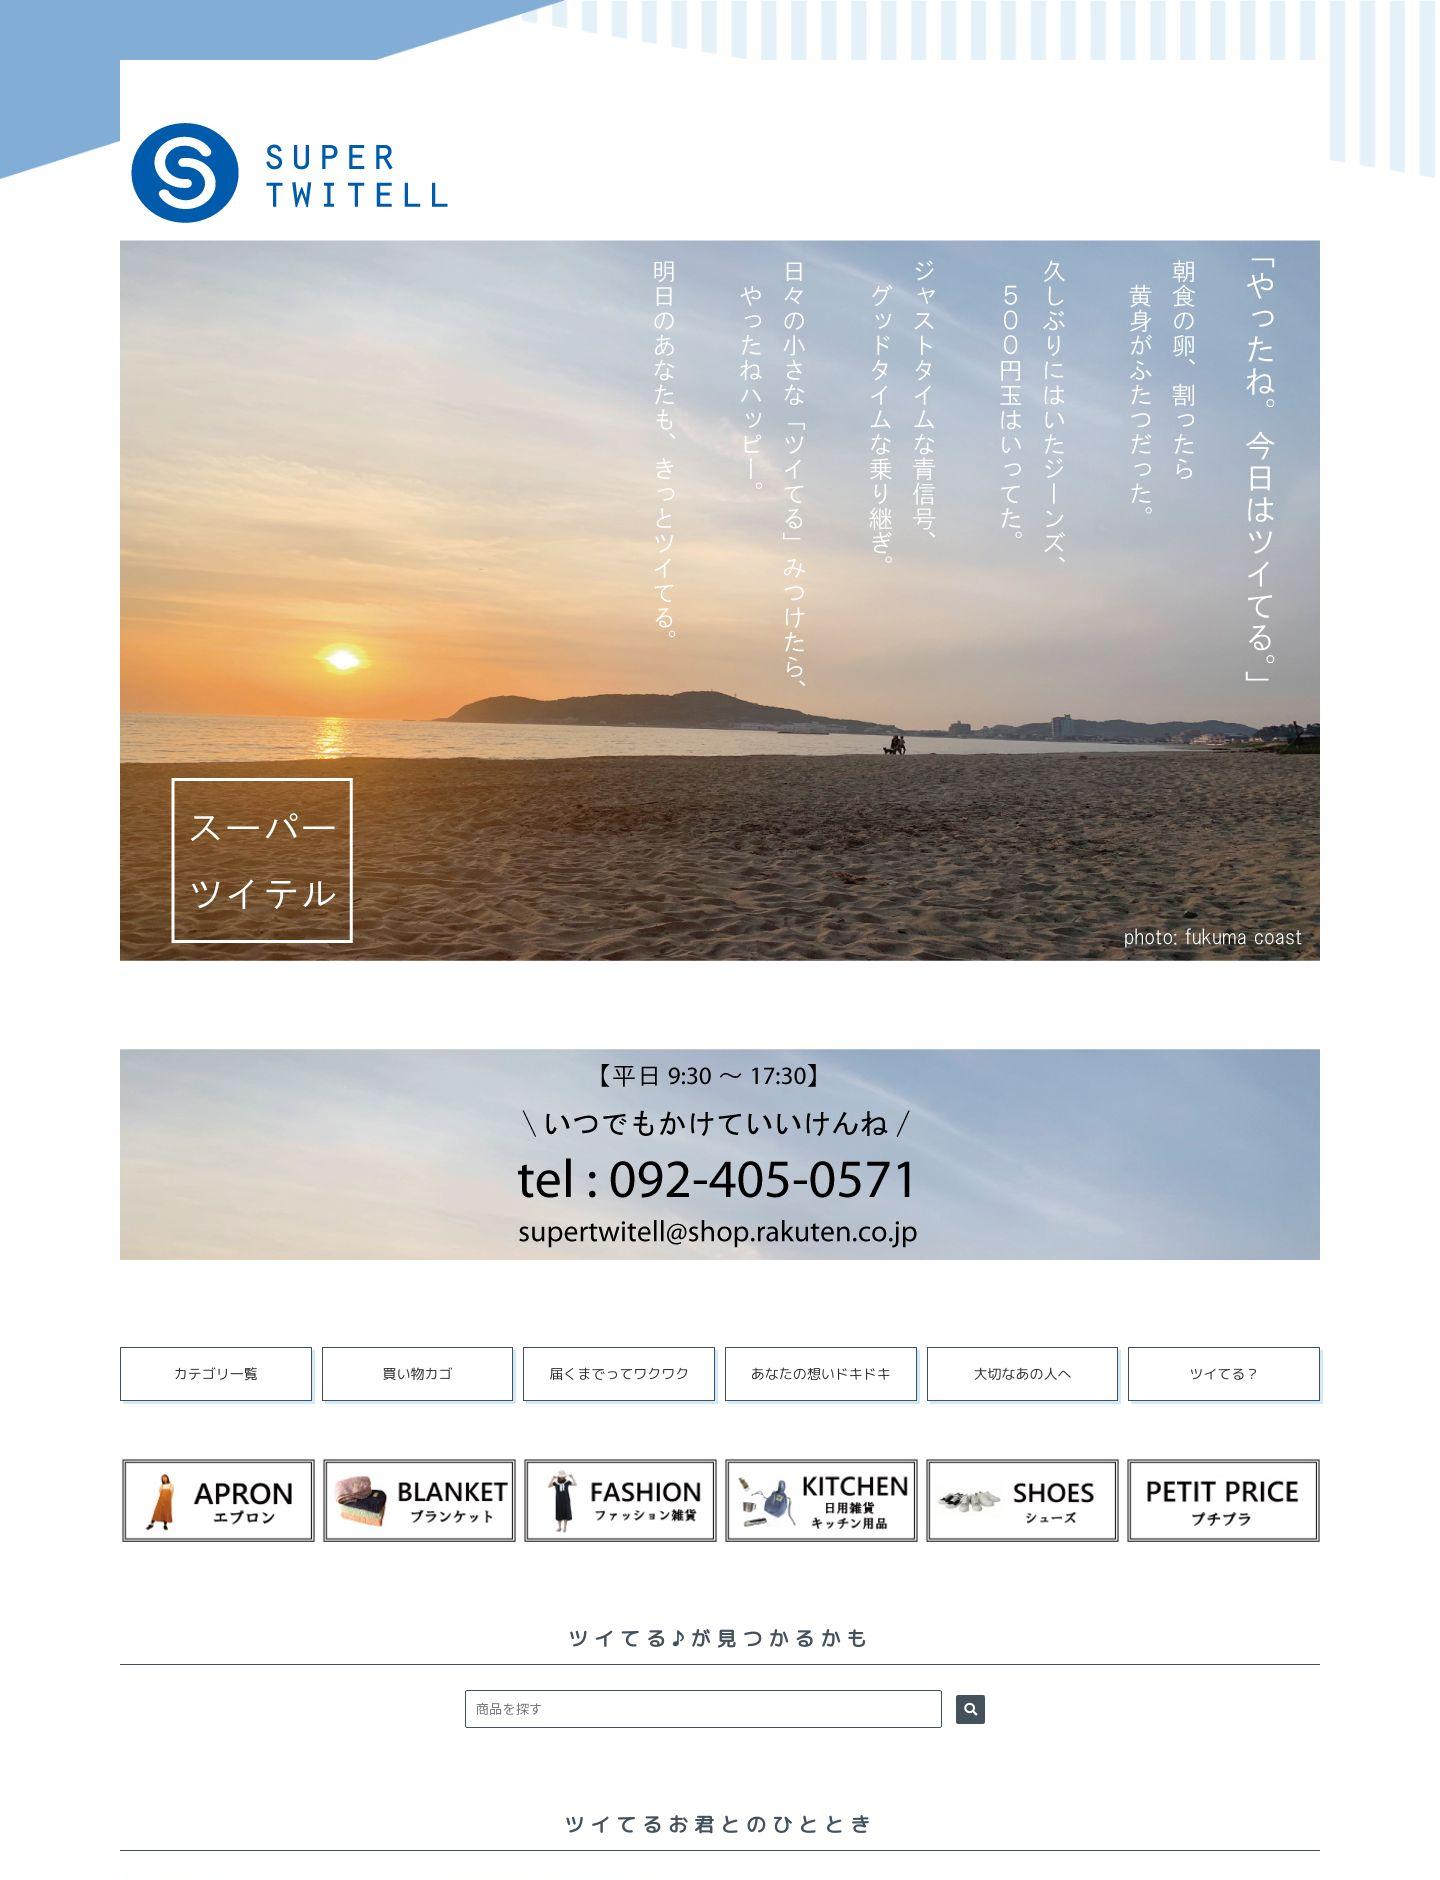 SUPER TWITELL 楽天市場店様 サイト画像